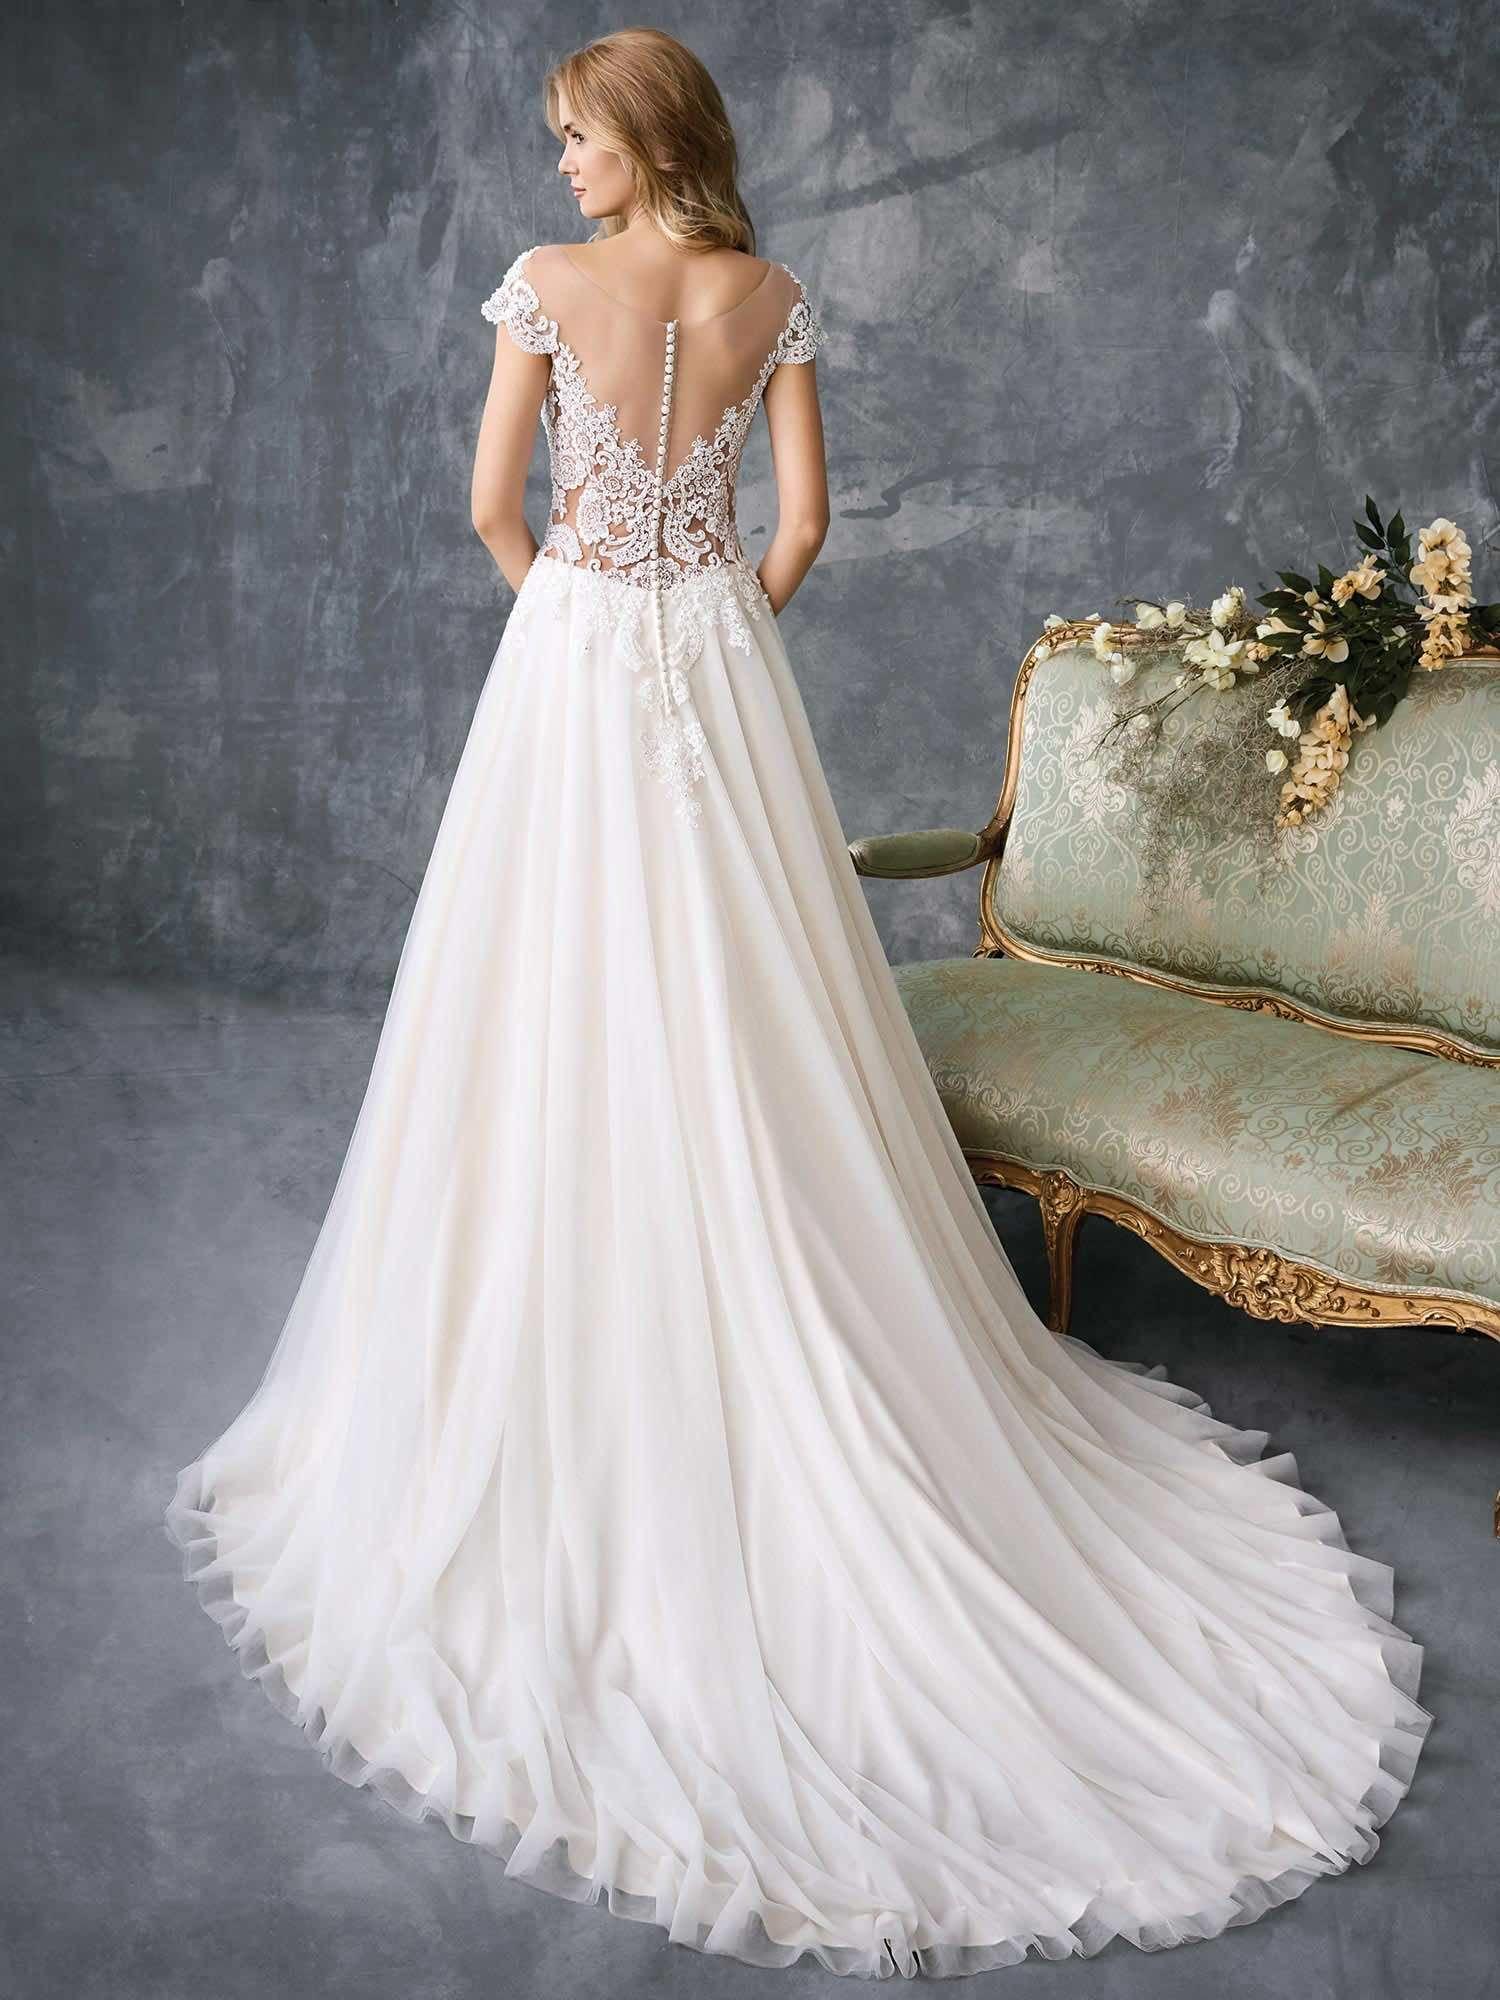 Timelessly Elegant 2018 Spring Kenneth Winston Wedding Dresses 1